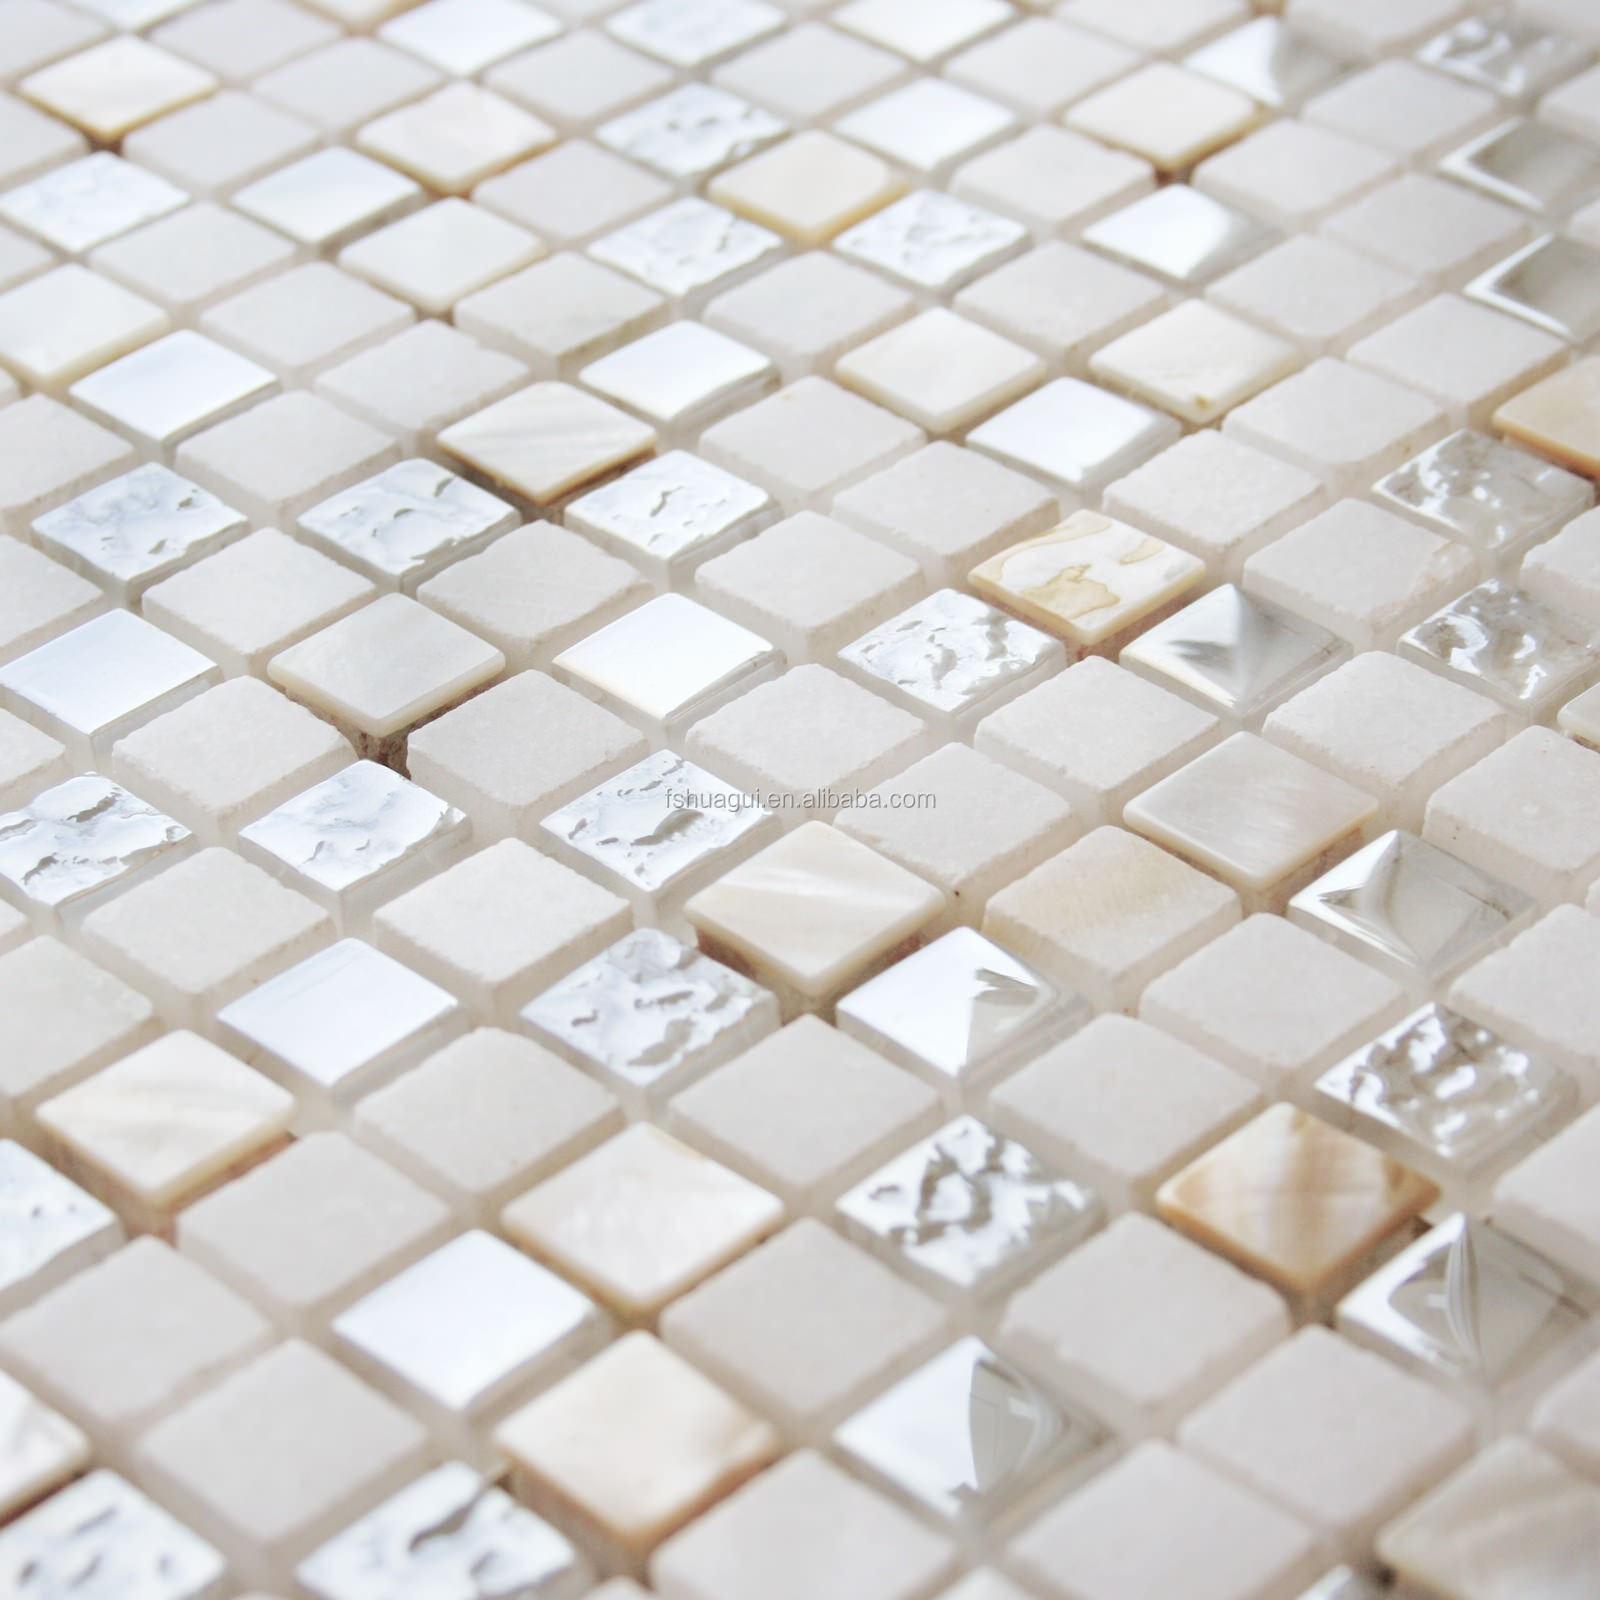 wholesale beige 15x15 8mm marble shell glass mosaic tile for wall backsplash decoration. Black Bedroom Furniture Sets. Home Design Ideas